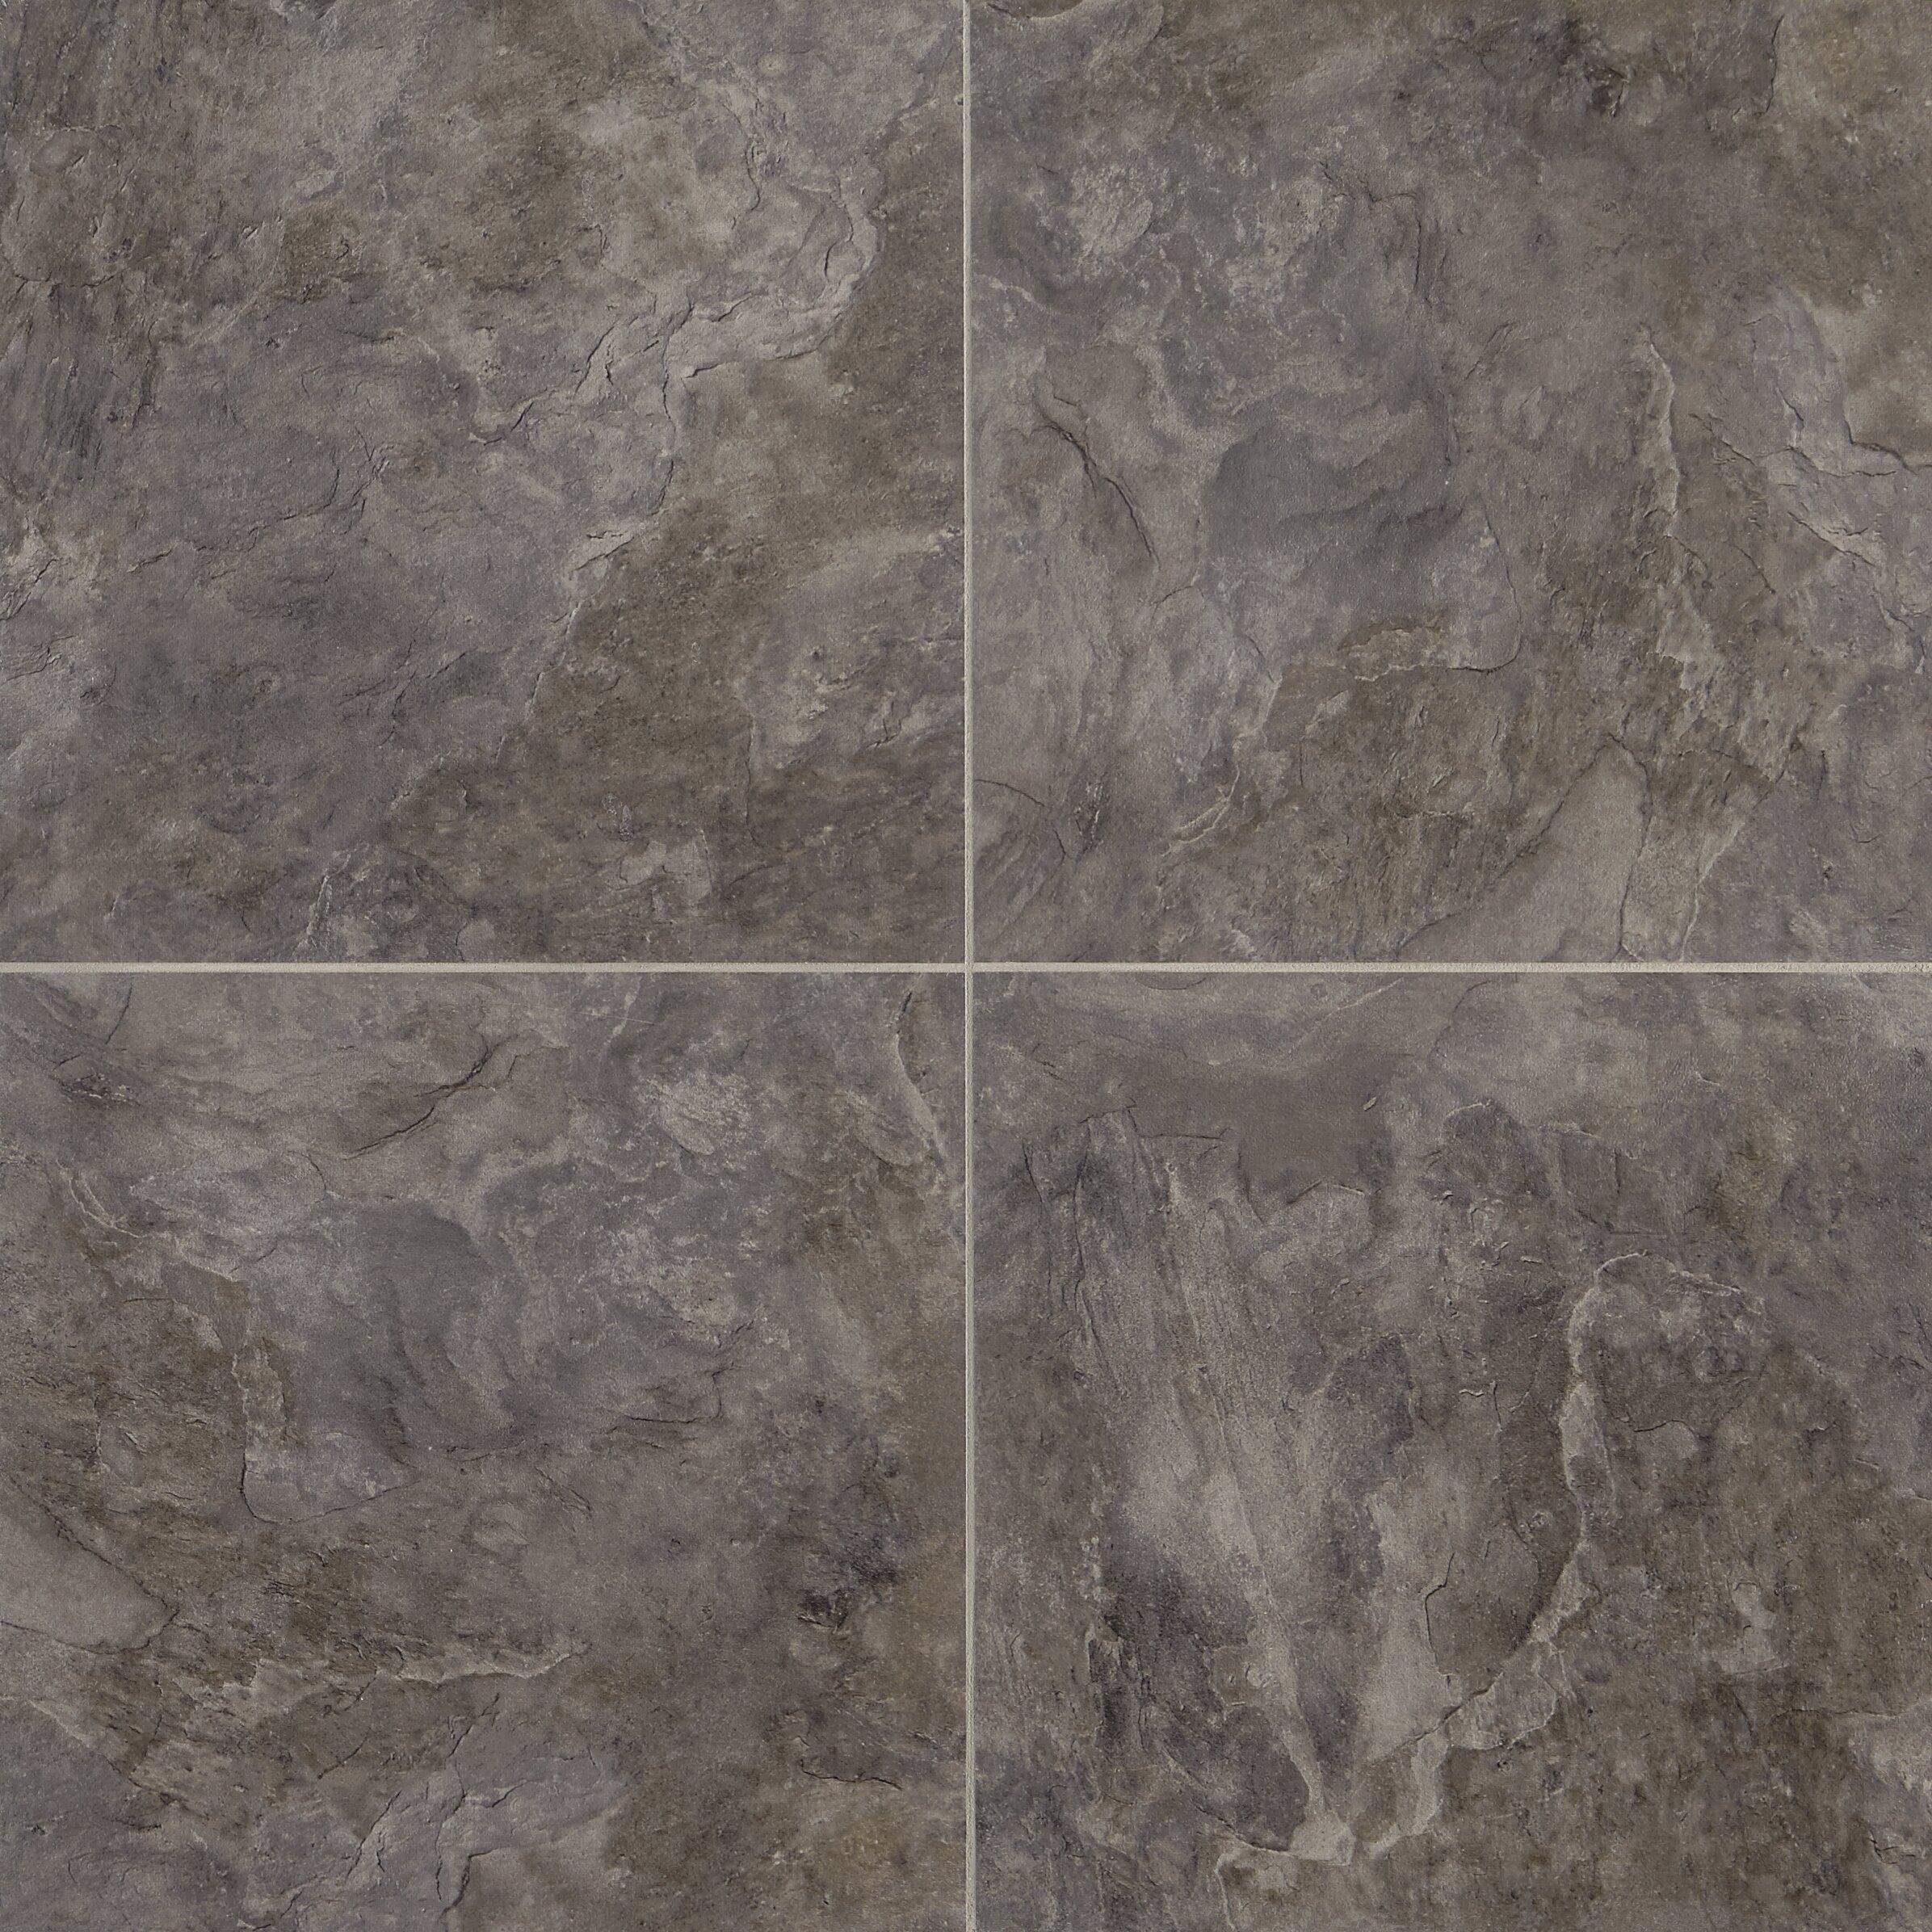 Mannington adura flex rushmore 18 x 18 x 2 5mm luxury vinyl tile wayfair